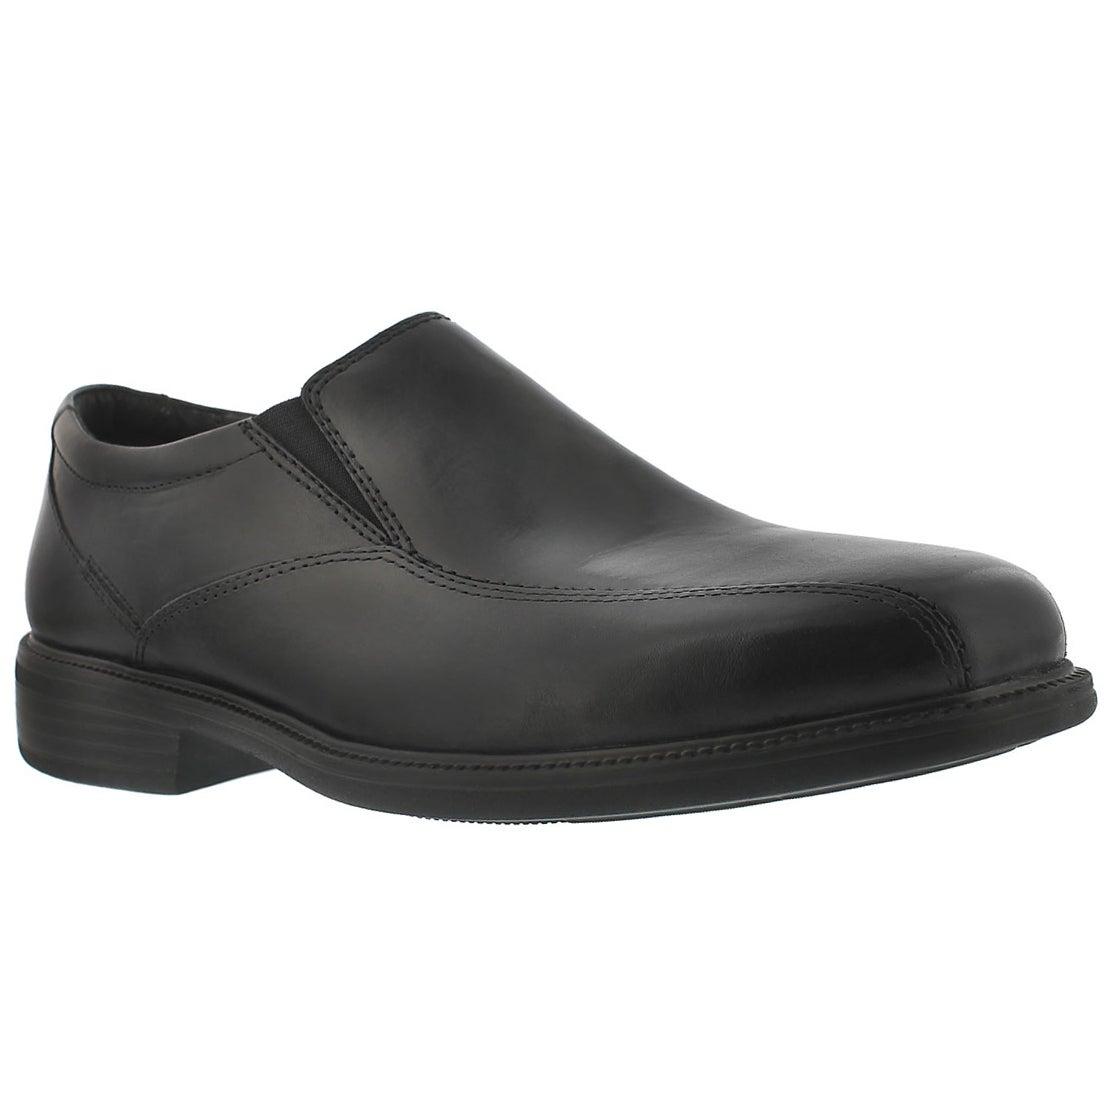 Men's BOLTON black dress slip-on shoes - Wide